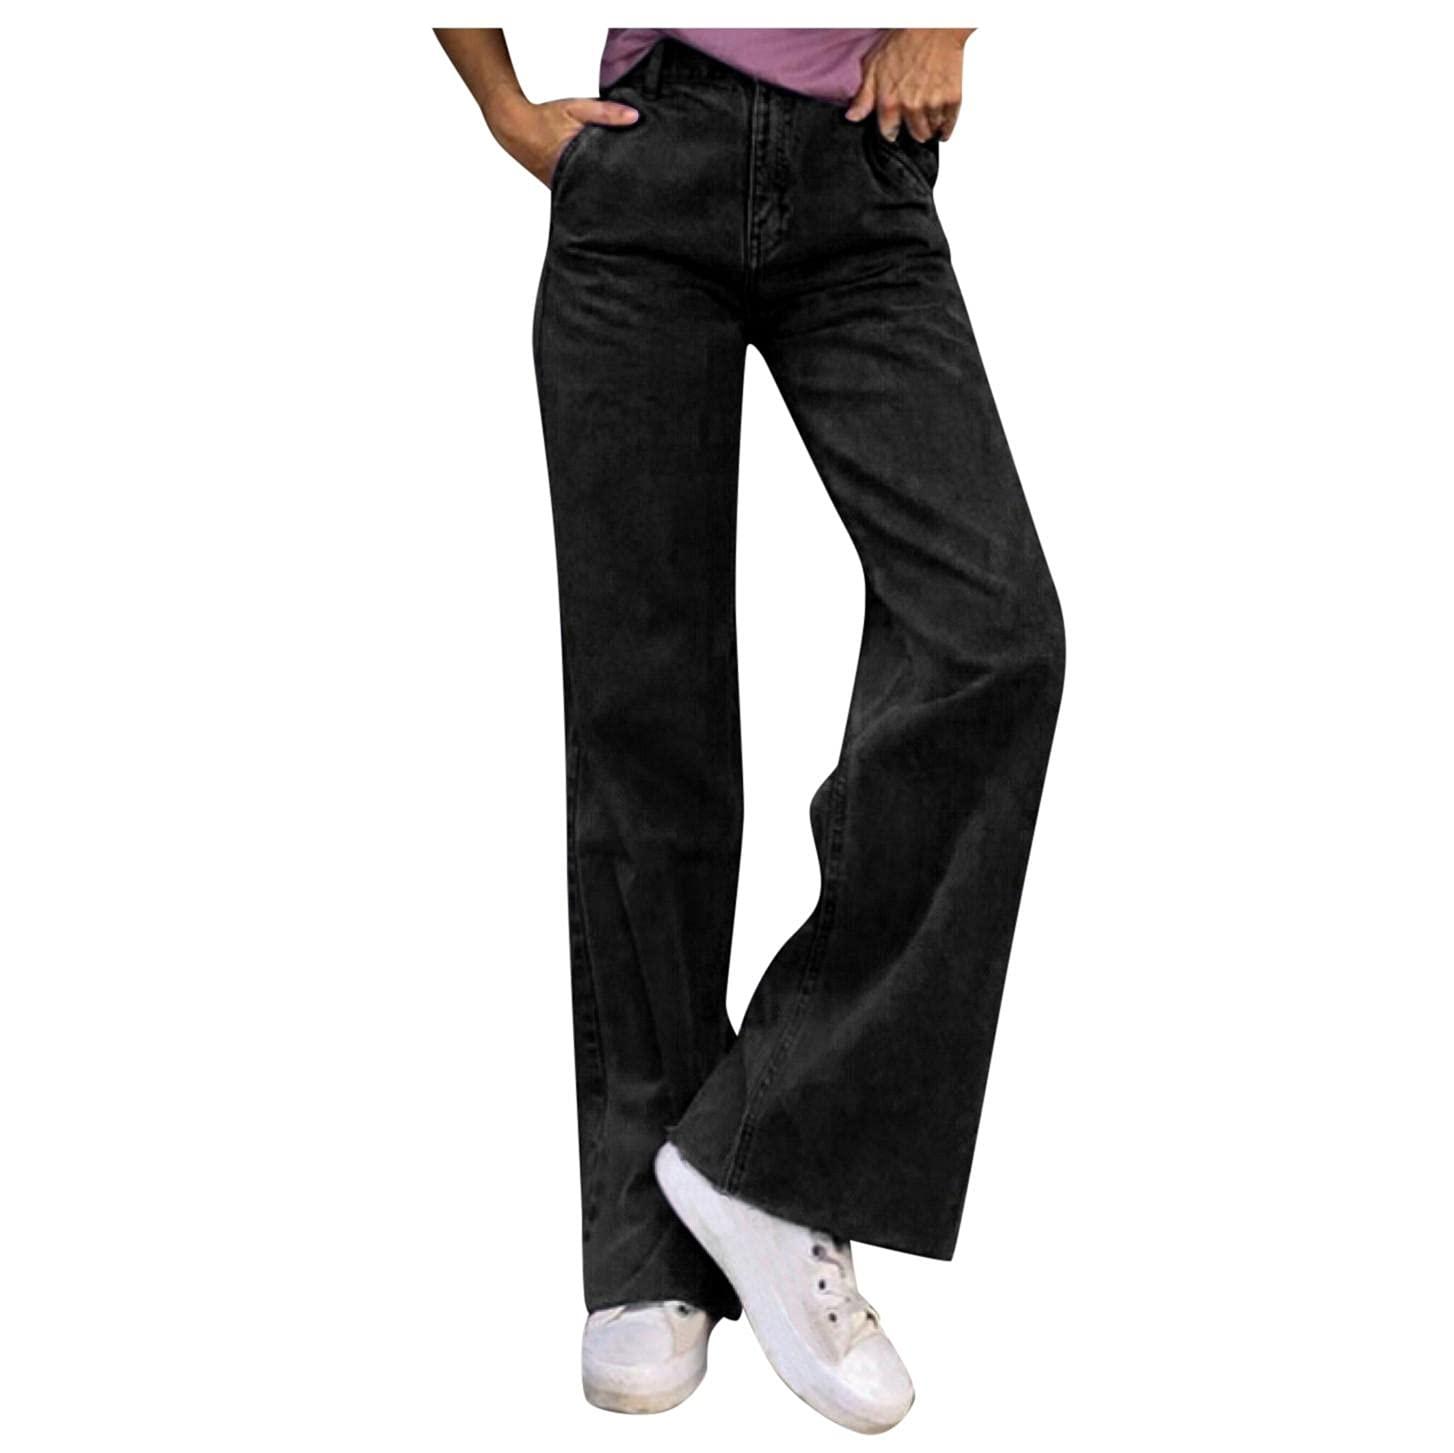 Padaleks Women's Stylish Flare Jeans High Waist Wide Leg Straight Demin Pants Casual Trousers Fashion Streetwear